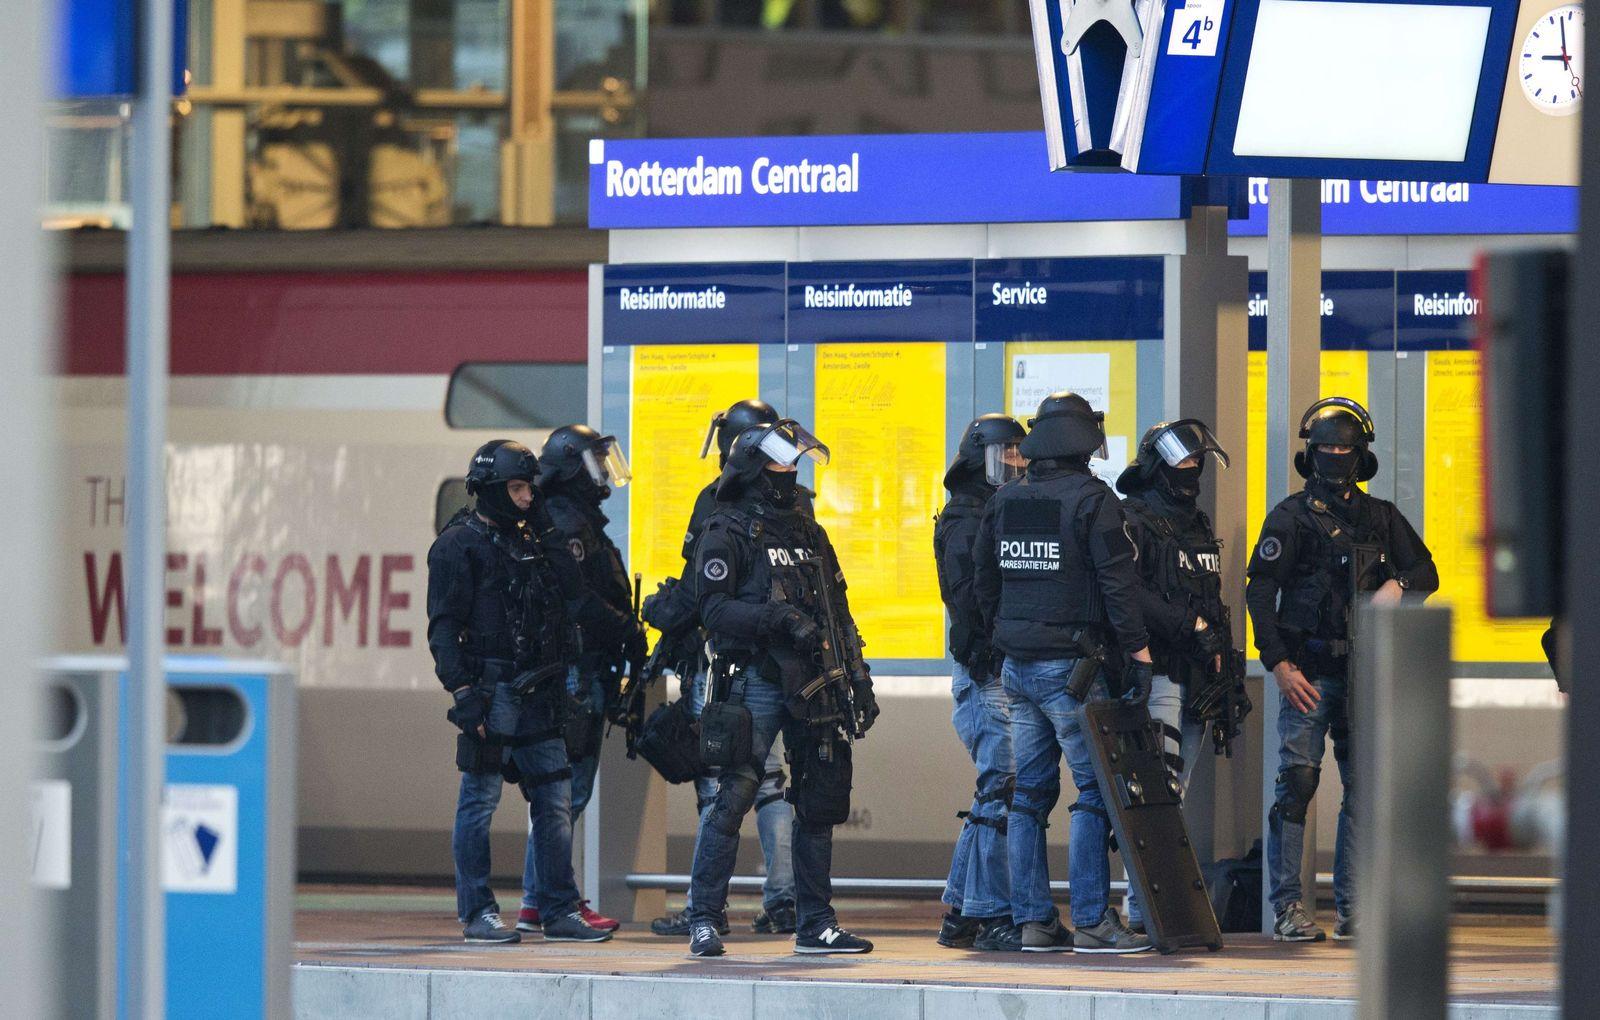 NETHERLANDS-TRANSPORT-POLICE-TRAIN